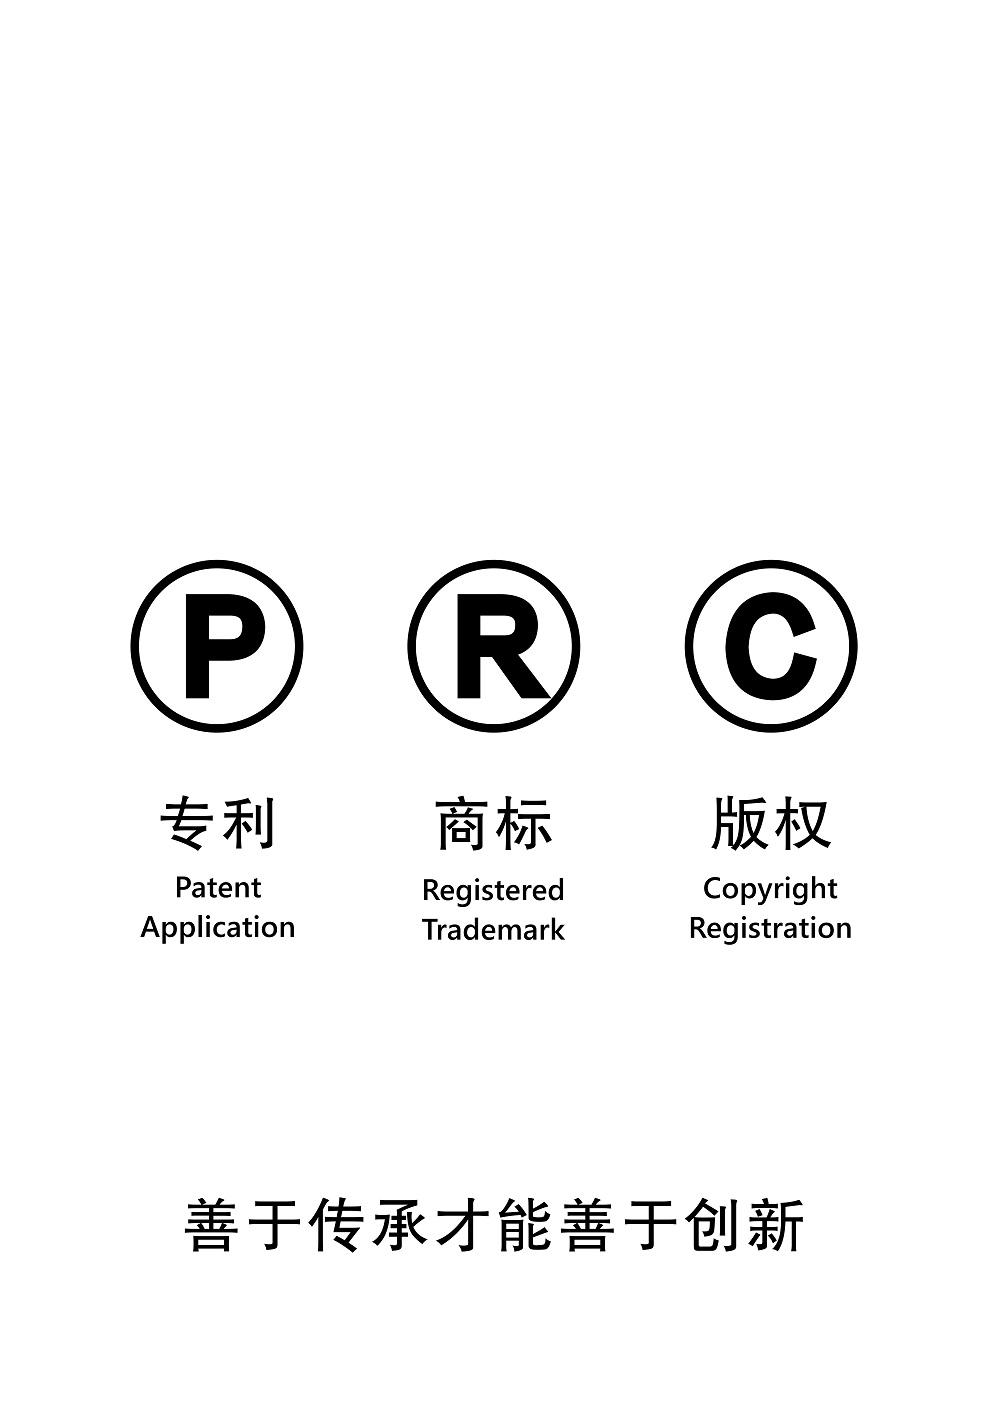 logo logo 标志 设计 图标 1000_1415 竖版 竖屏